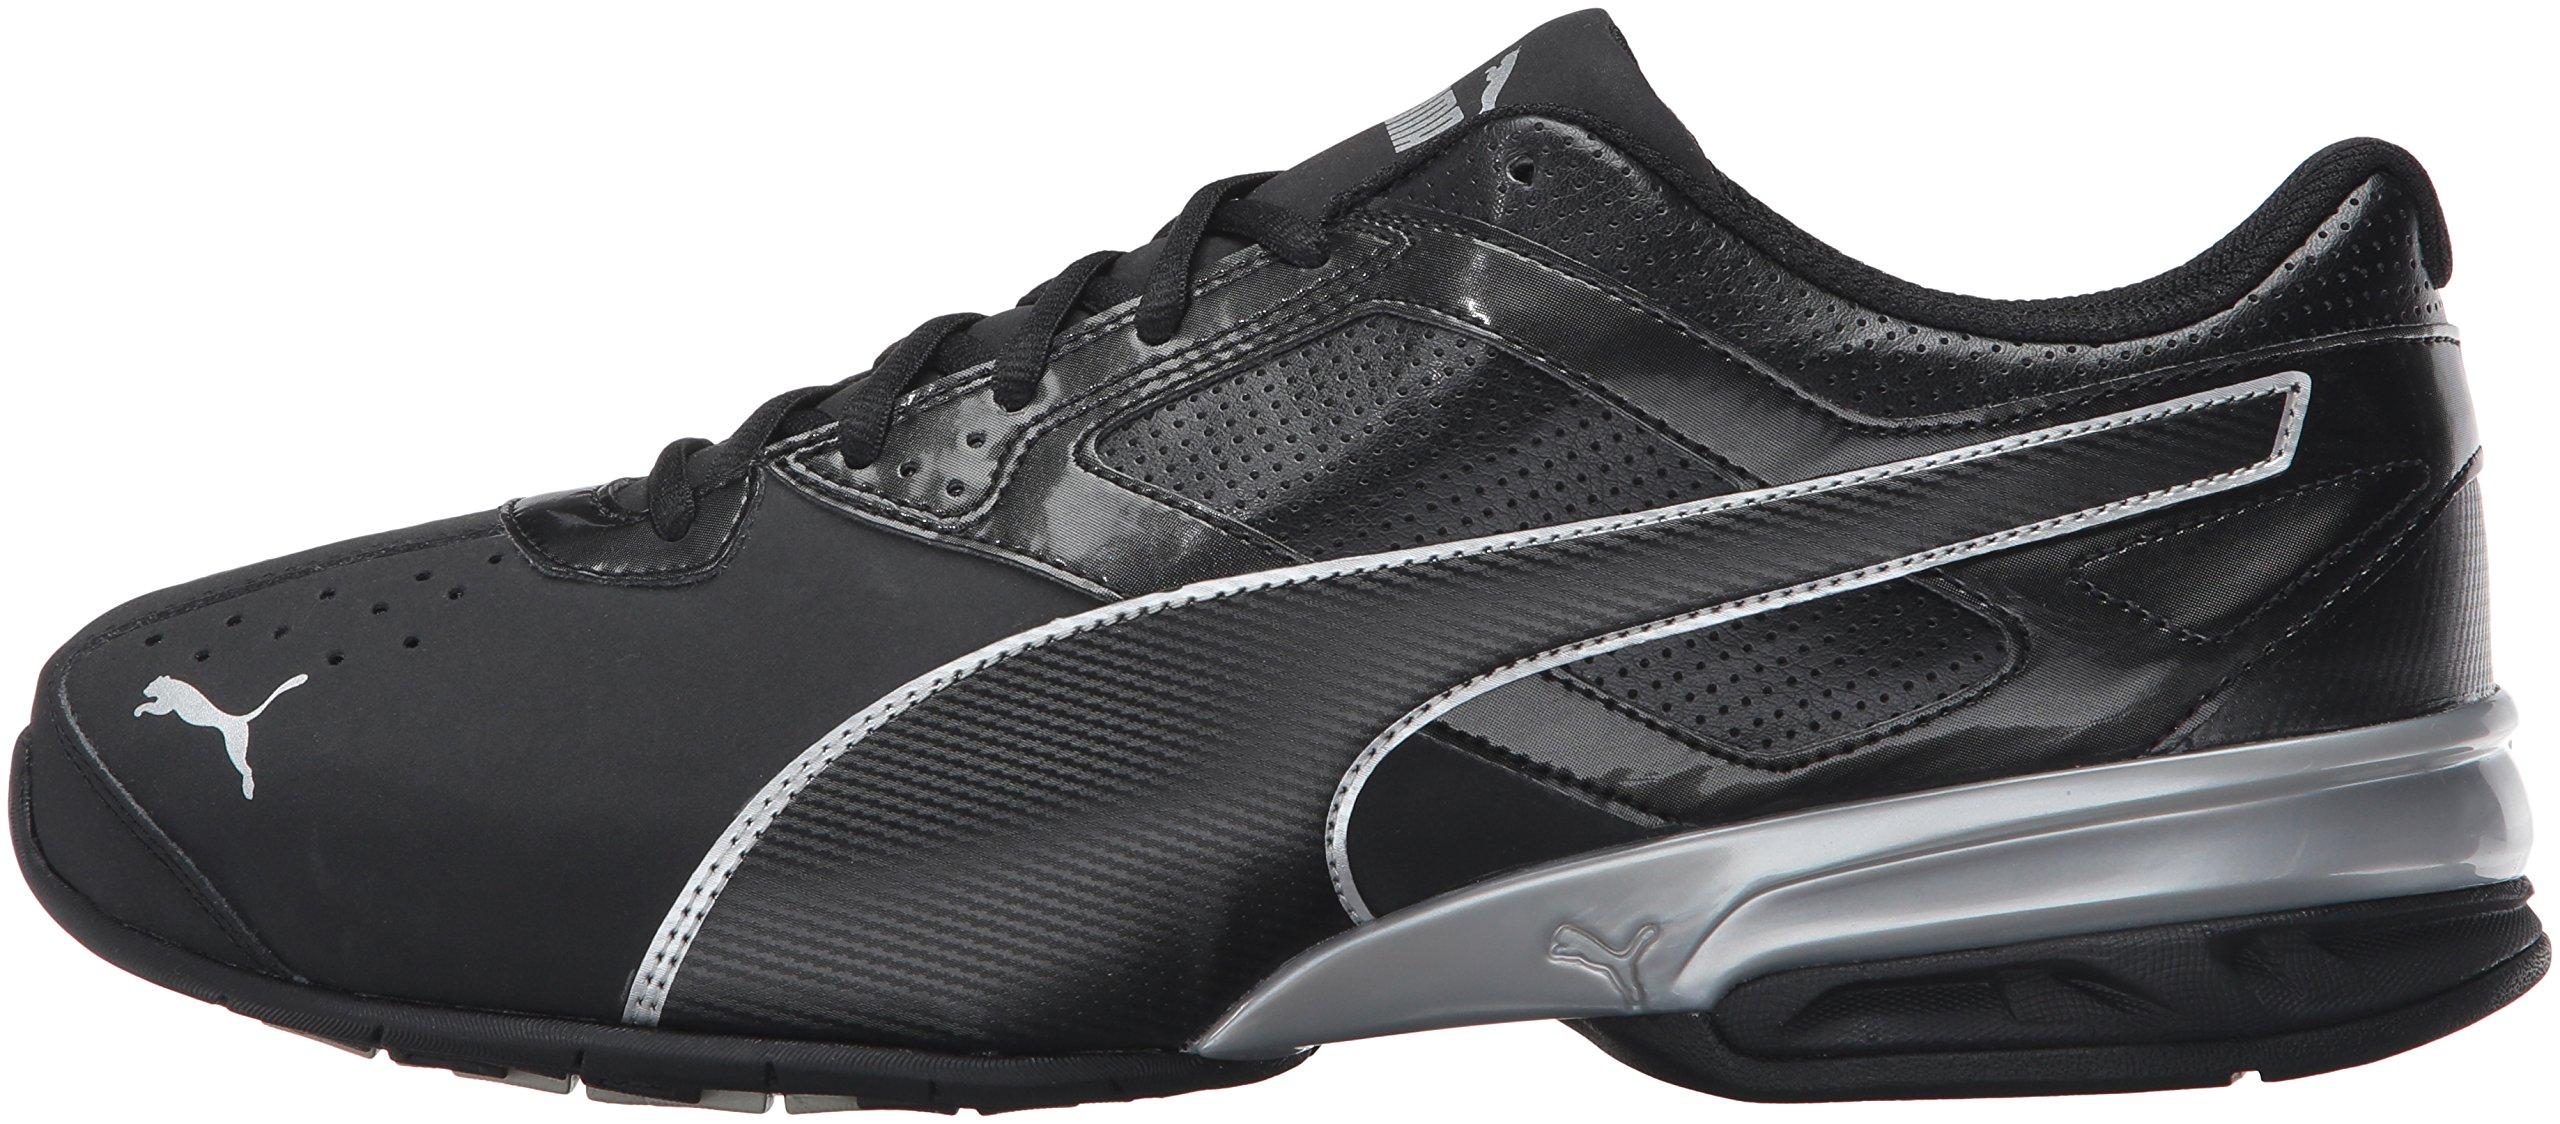 PUMA Men's Tazon 6 FM Puma Black/ Puma Silver Running Shoe - 8 D(M) US by PUMA (Image #5)